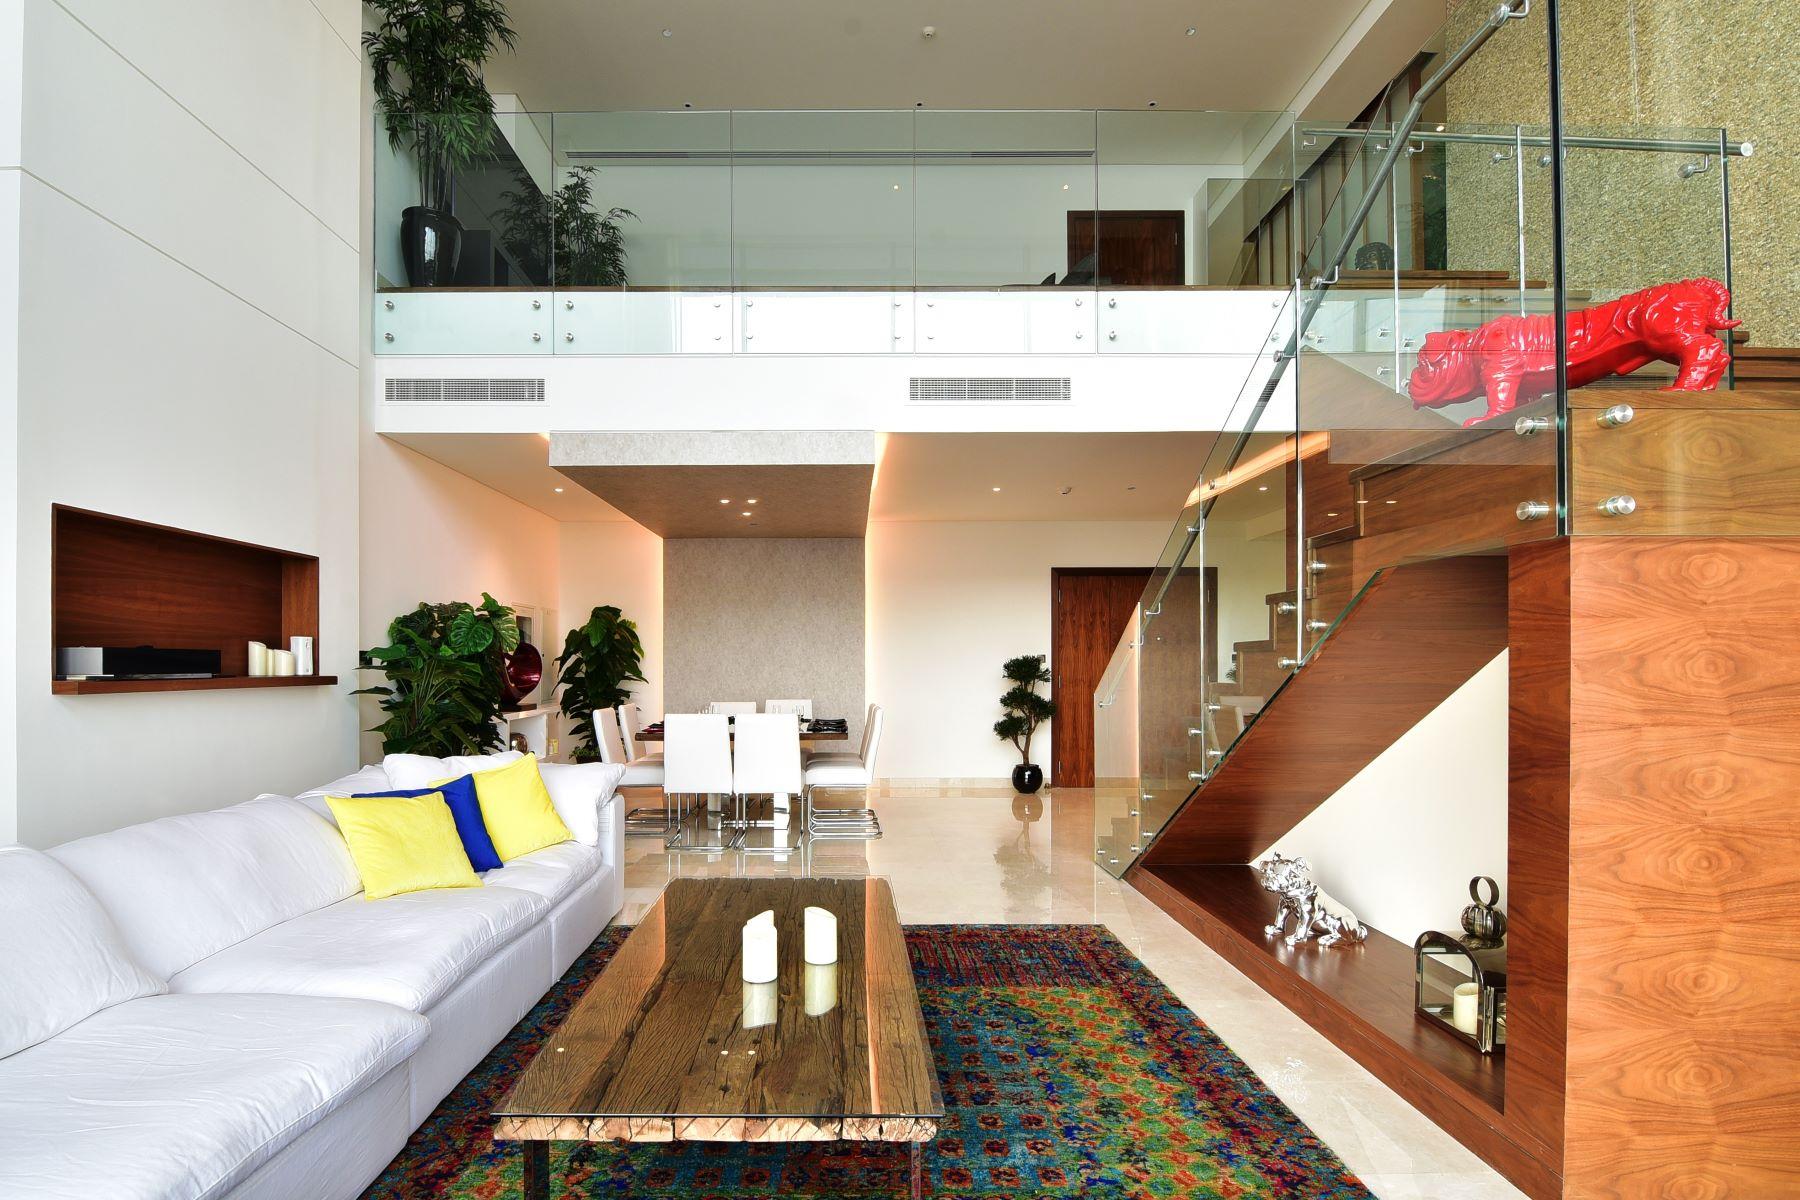 Apartments for Sale at Luxury Penthouse with Full Marina View Dubai, Dubai United Arab Emirates